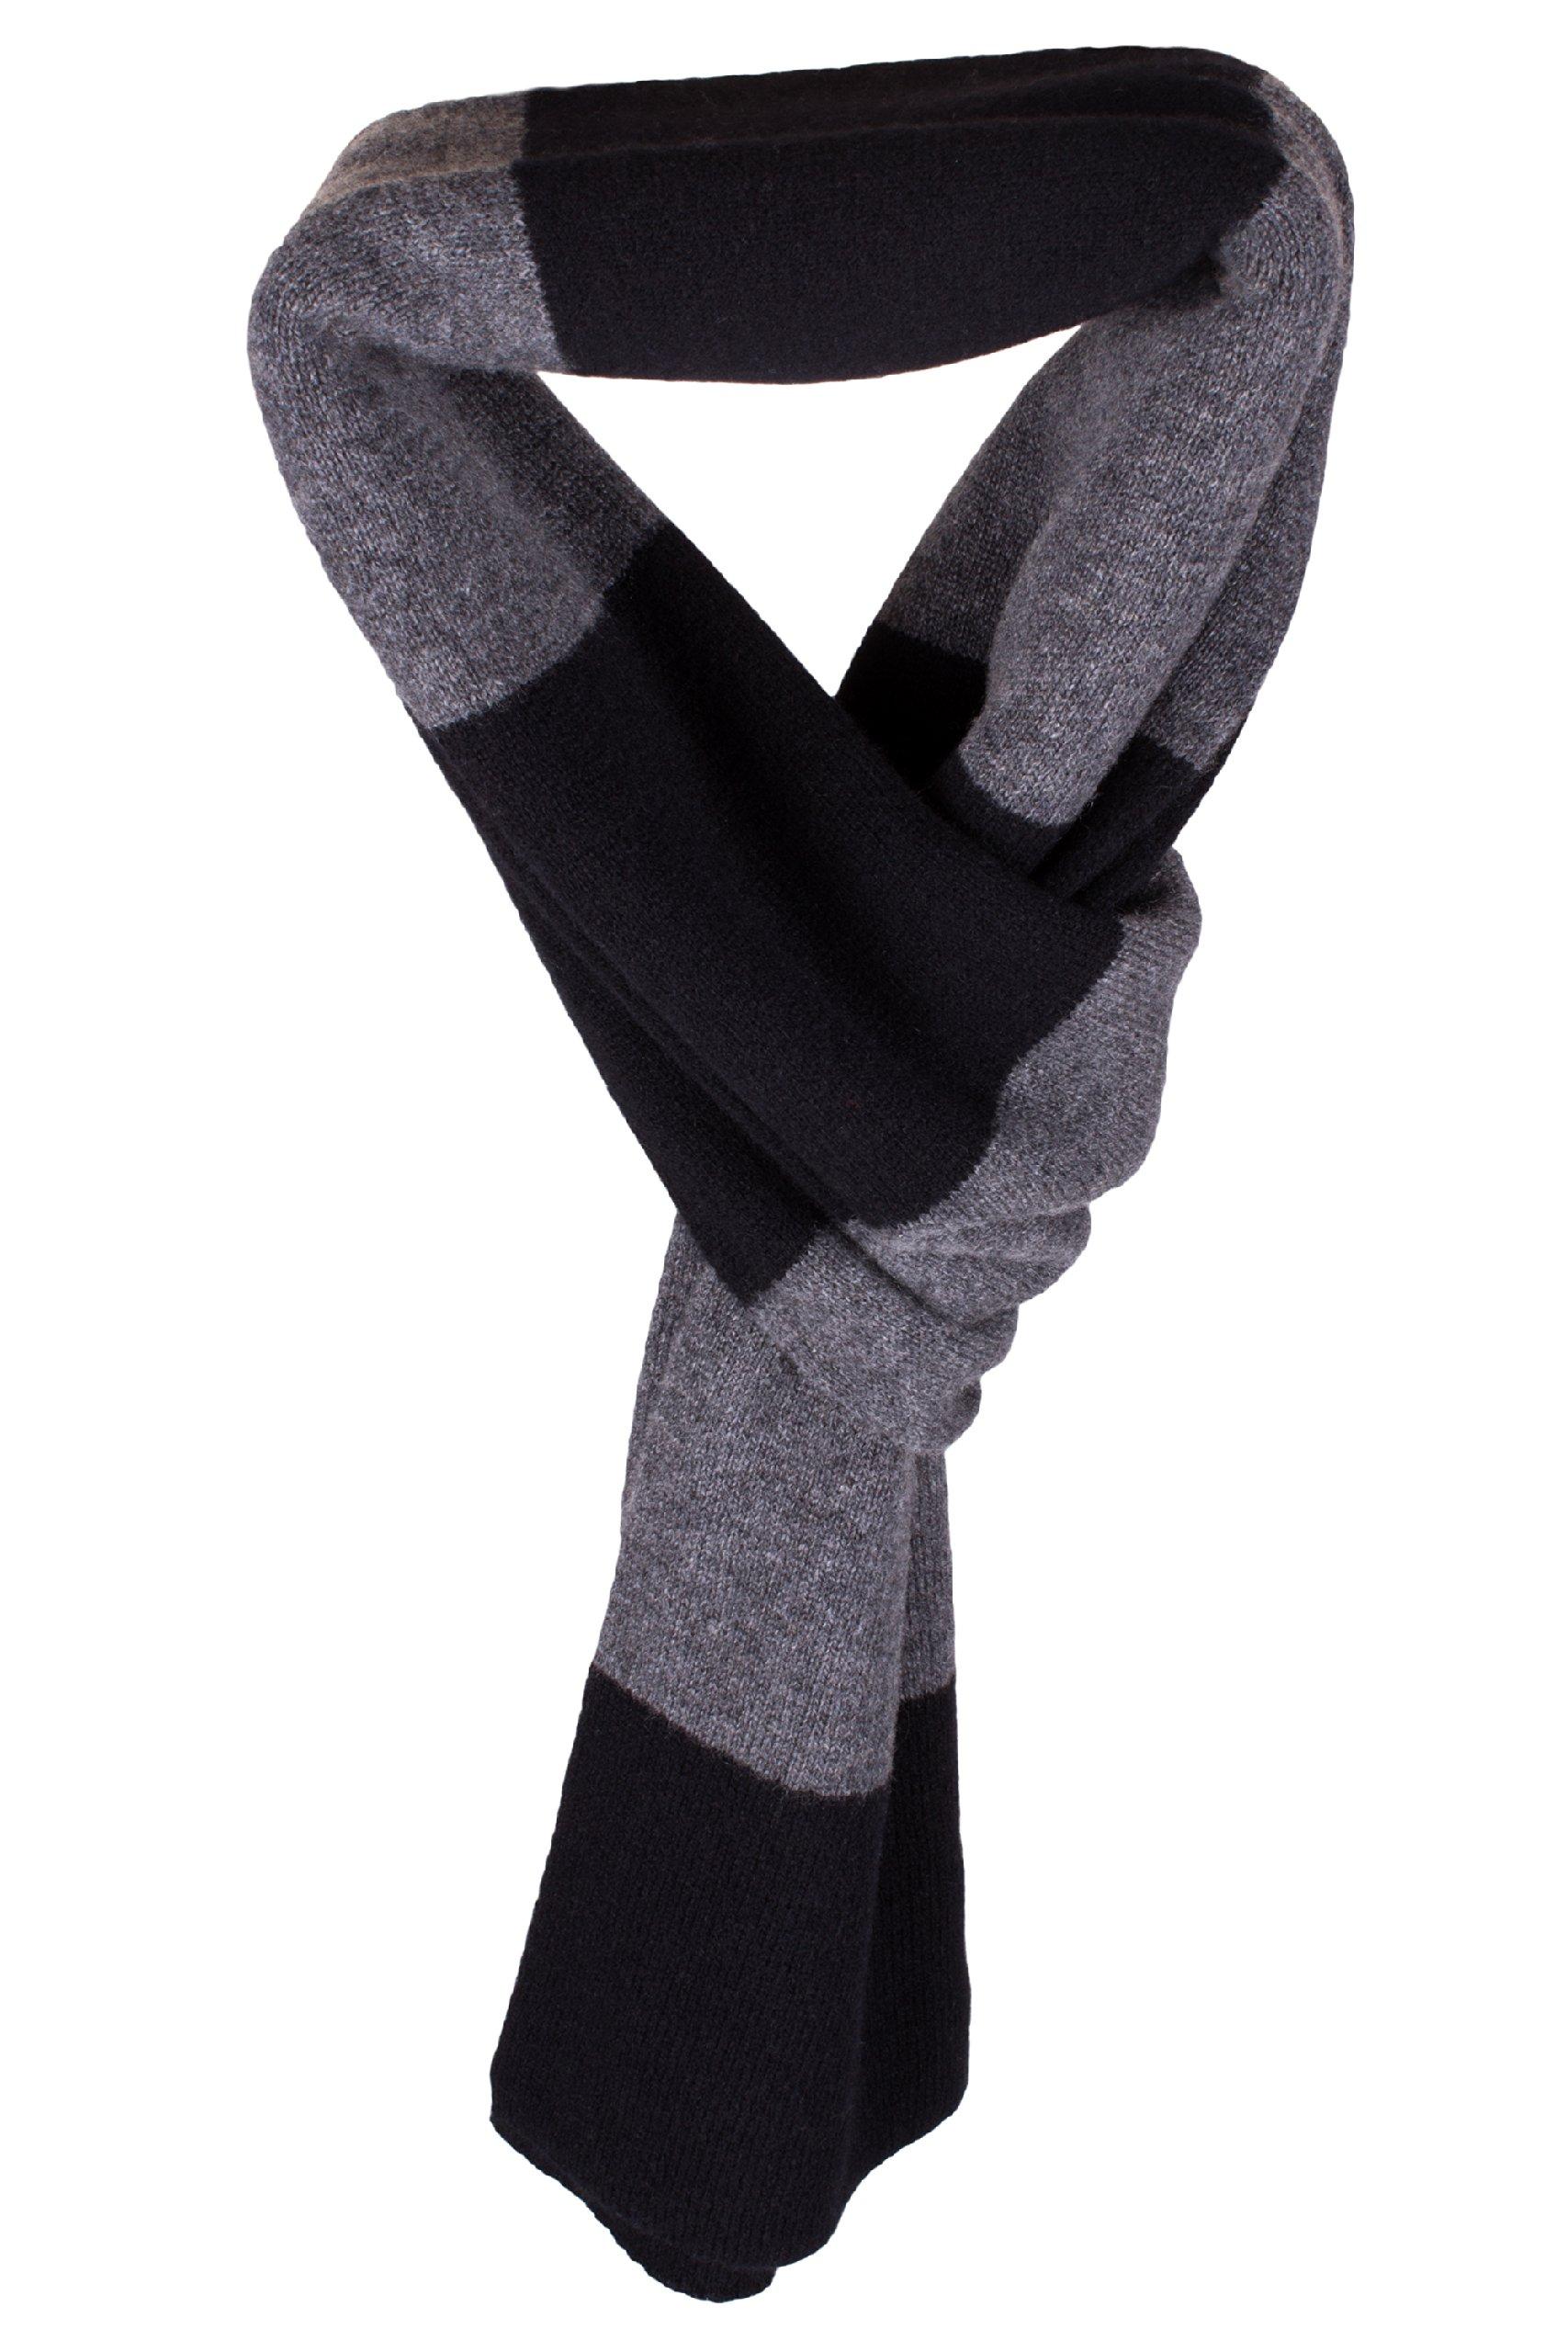 Mens Striped 100% Cashmere Scarf - Black / Dark Gray - hand made in Scotland by Love Cashmere